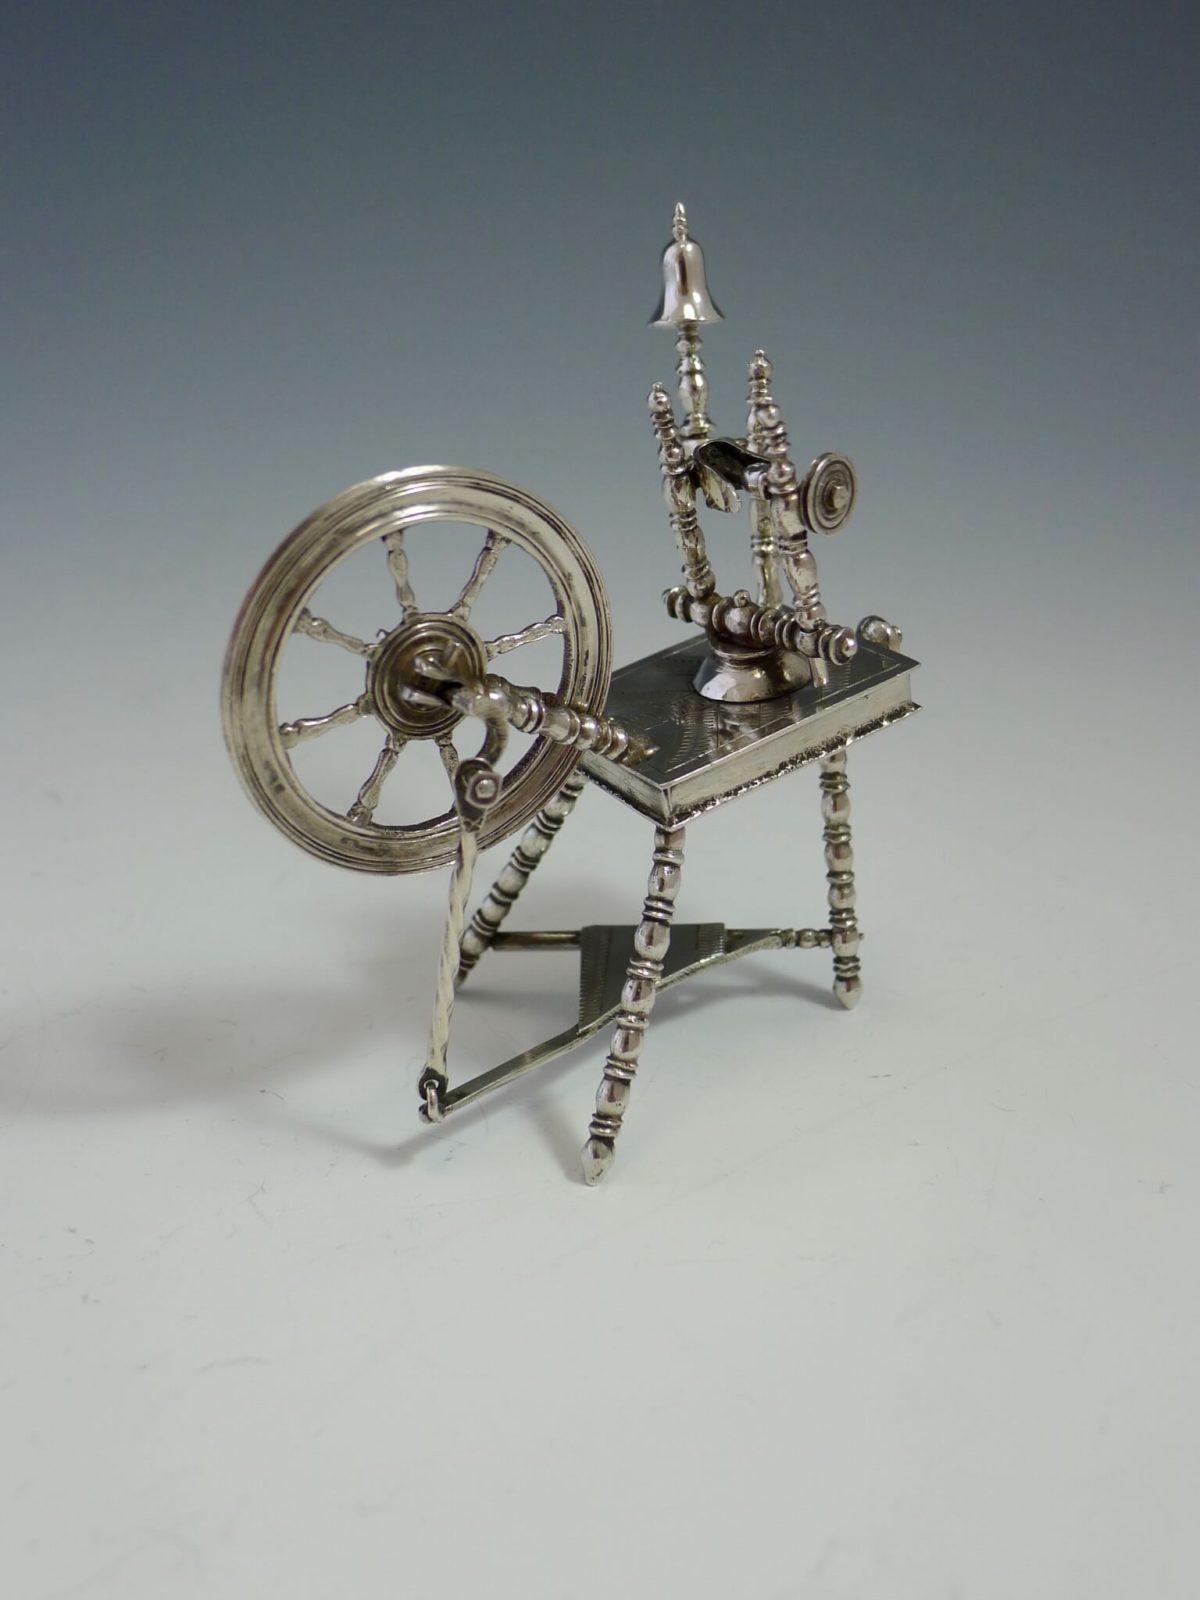 P1360150 1200x1600 - Miniatuur spinnewiel ( verkocht )